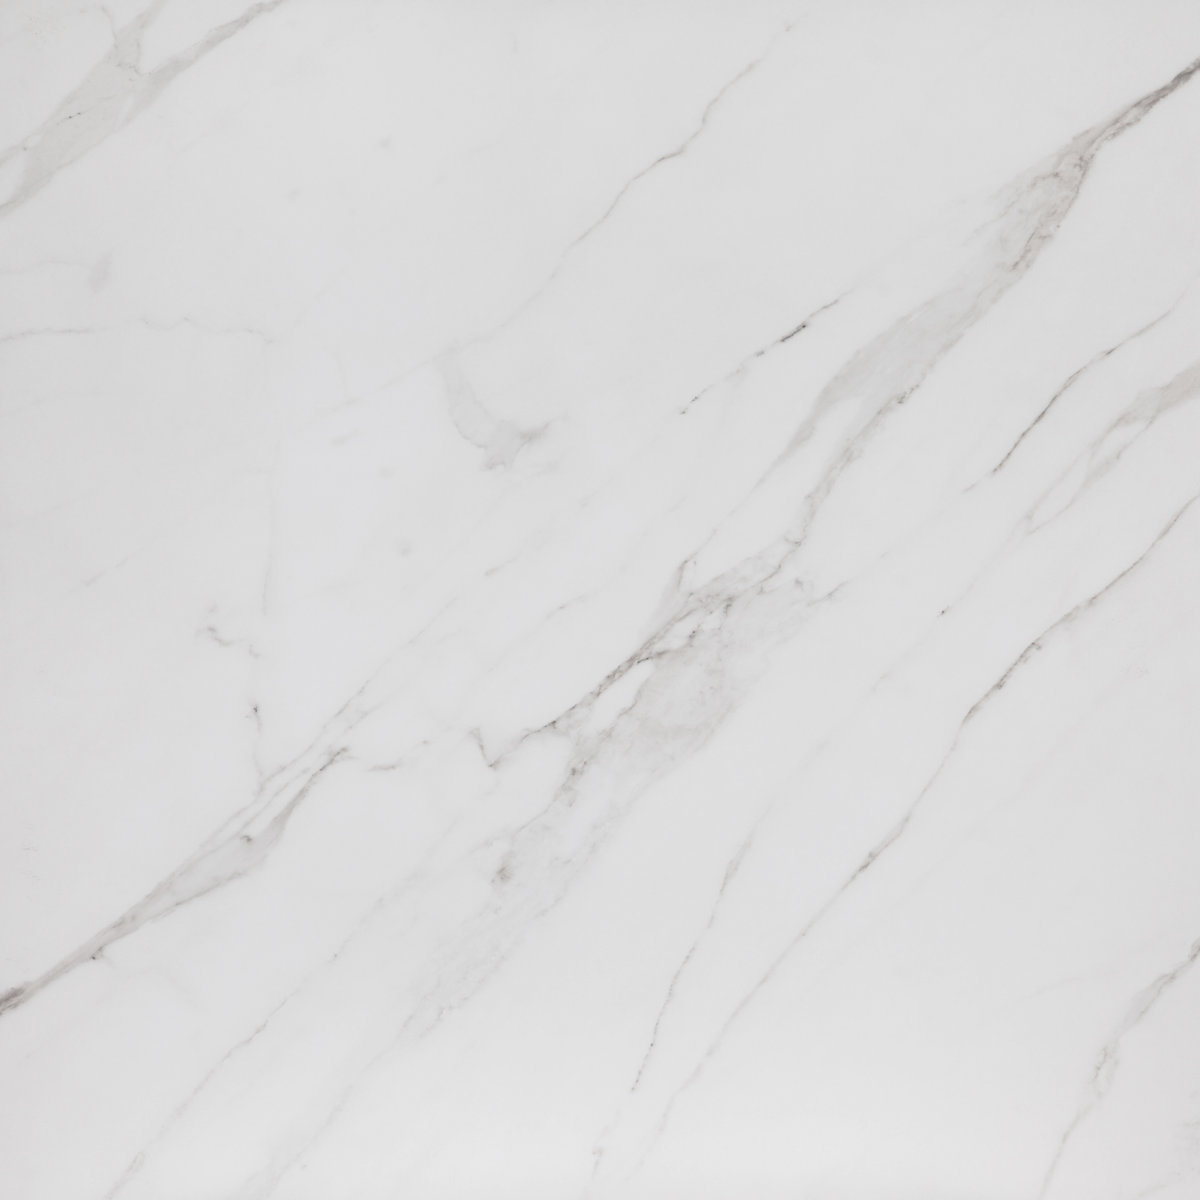 Eli Mont Blanc AC 900x900mm_Stiles_Product2_Image